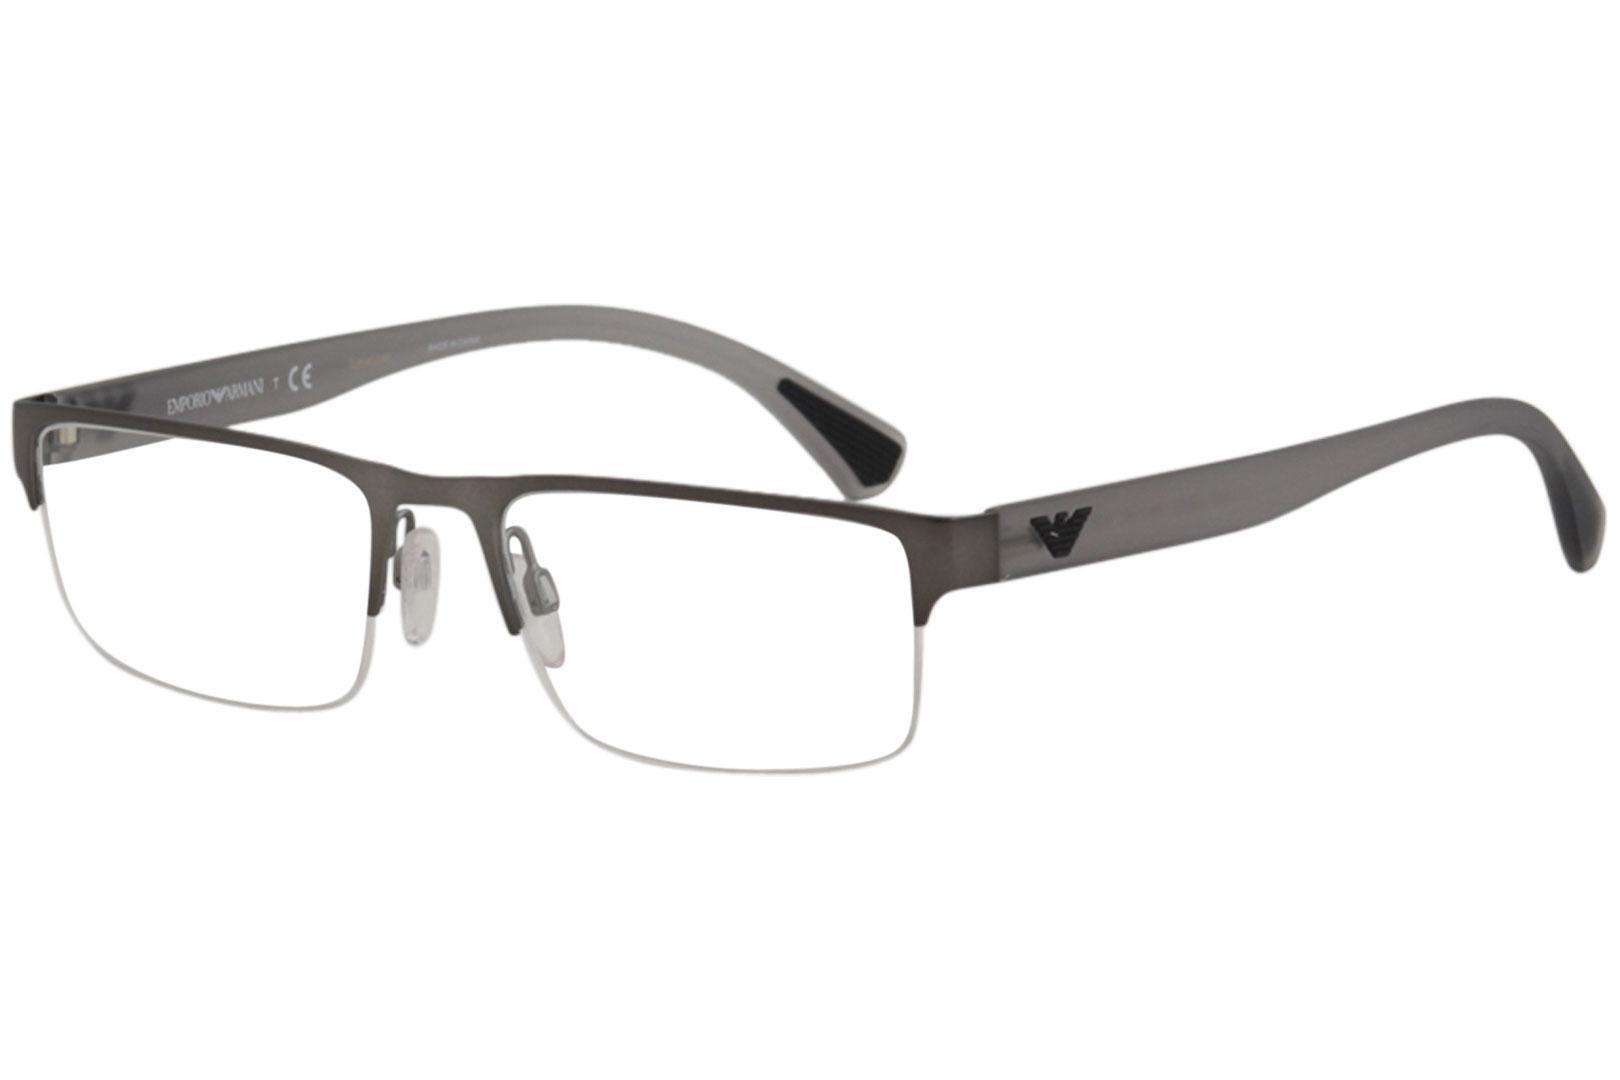 25da3dc2f0f Emporio Armani Men s Eyeglasses EA1050 EA 1050 Half Rim Optical Frame